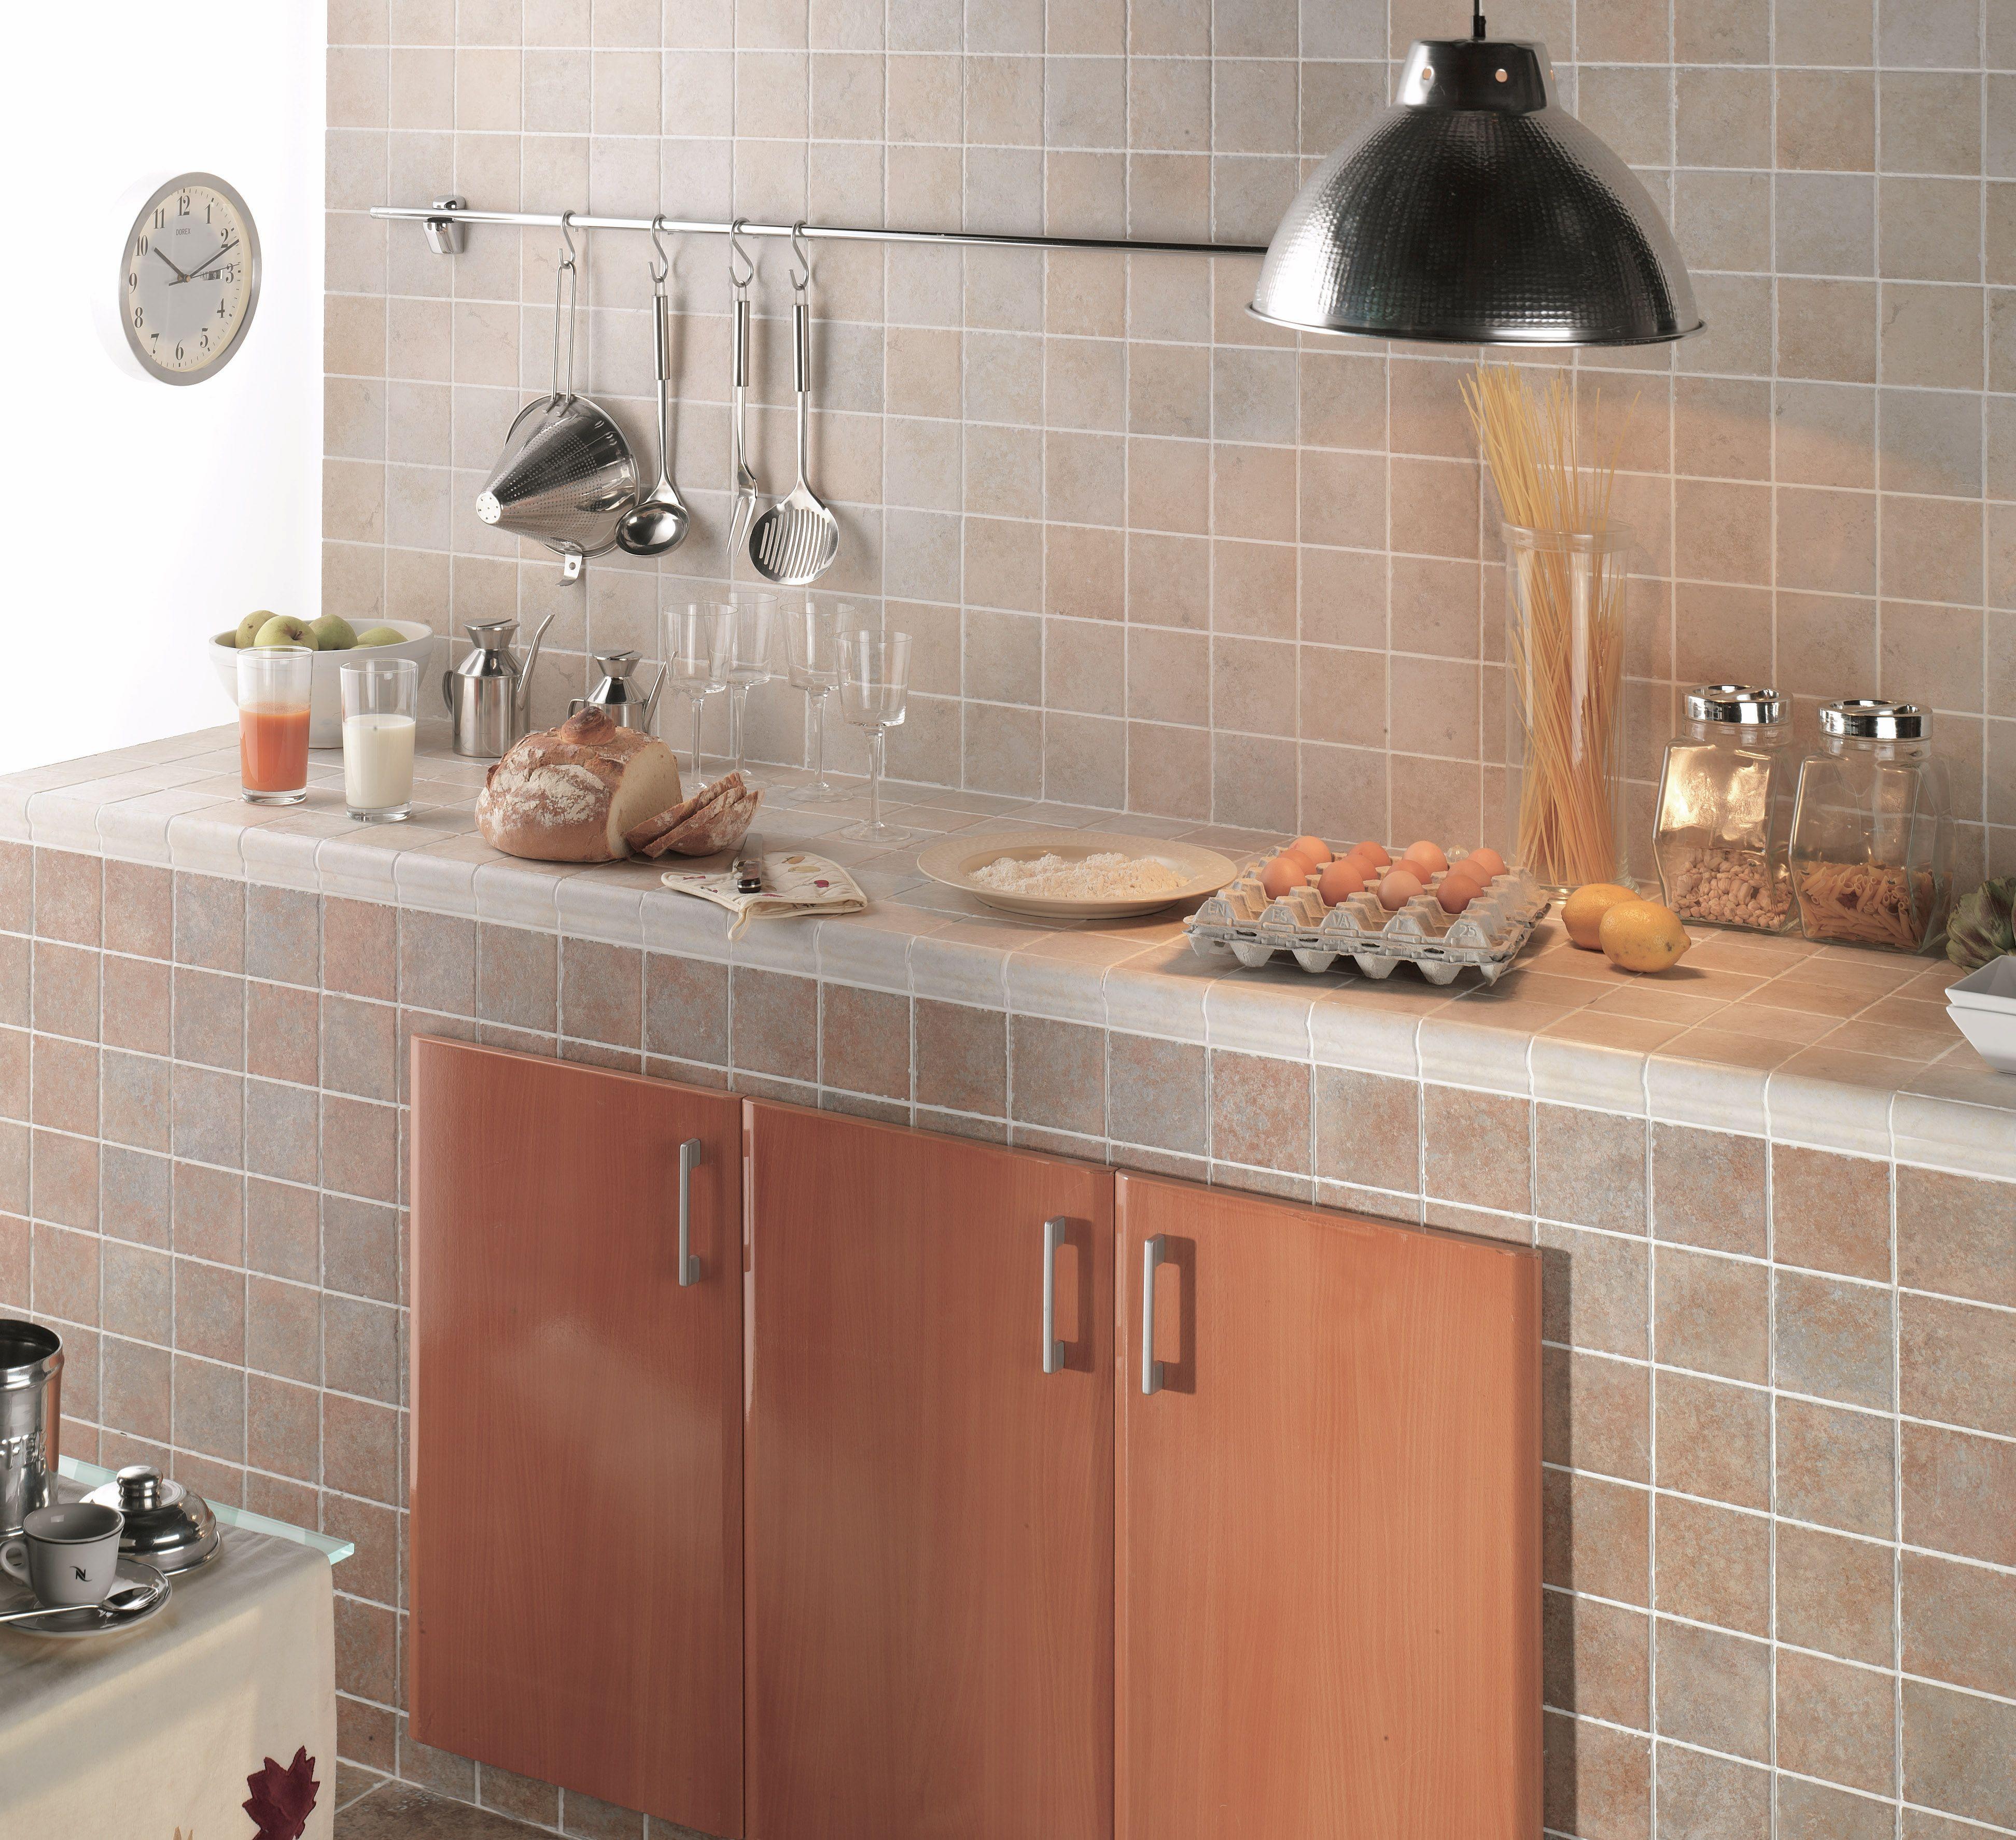 Ceramic Tile, Porcellanato, RAK, Model SCABAS Size 10 x